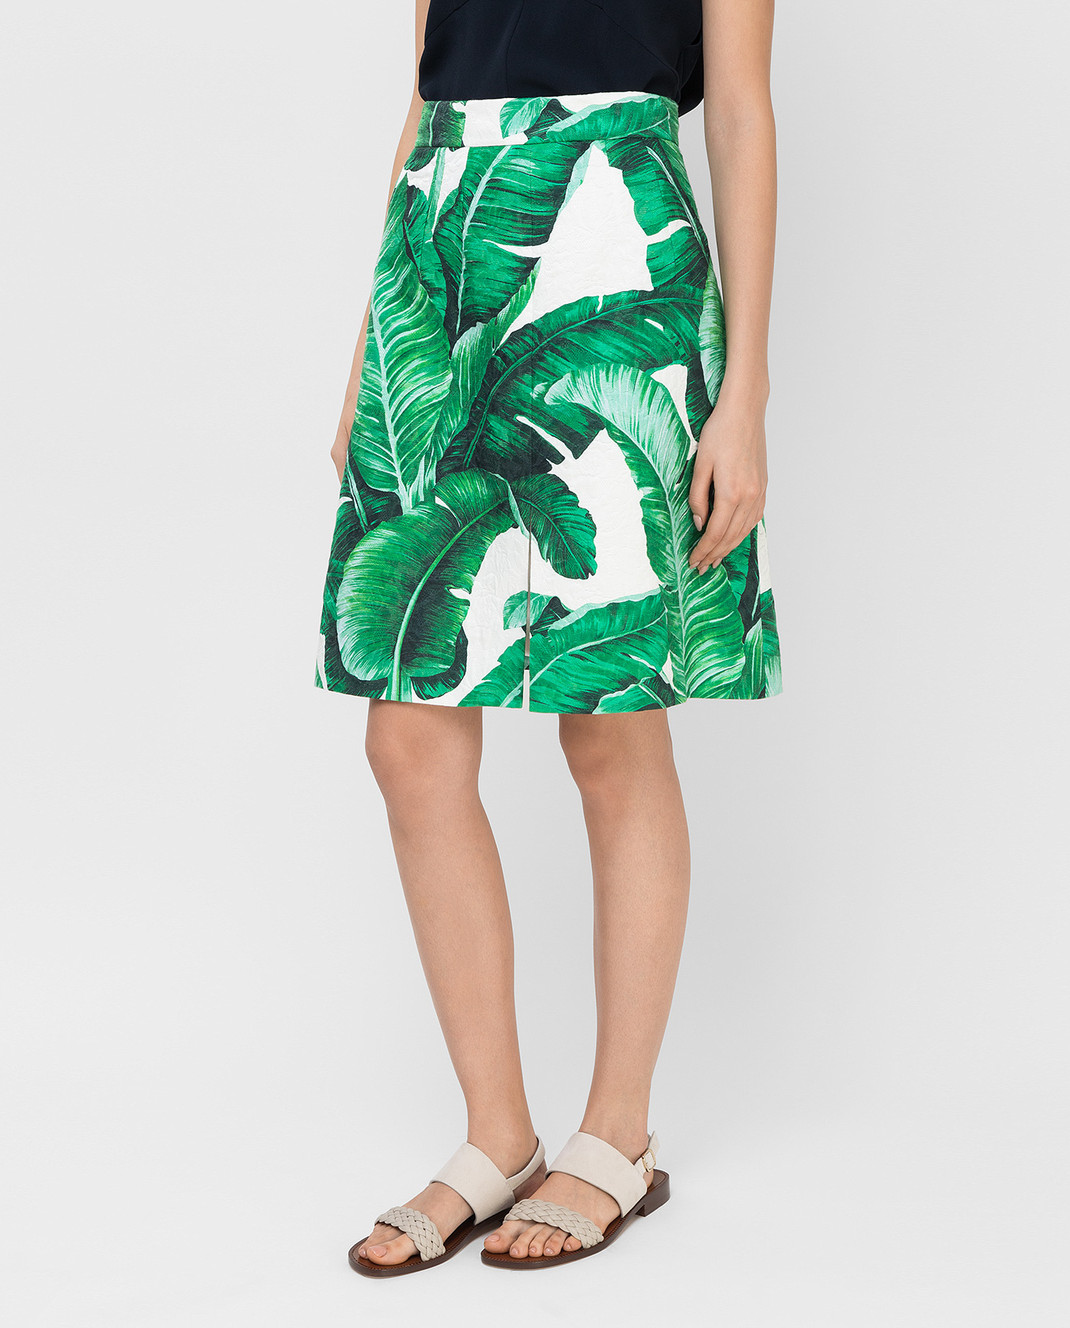 Dolce&Gabbana Зеленая юбка F4AKYTFSMY7 изображение 3